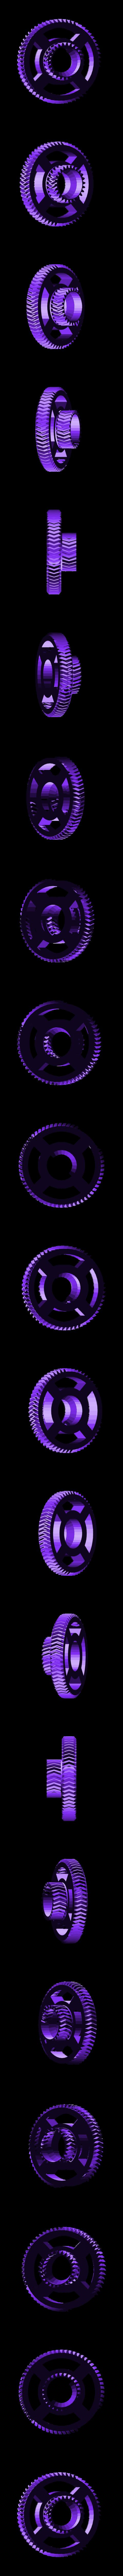 Drive_gear_B.stl Download free STL file Bubbles! • 3D printer object, Zippityboomba